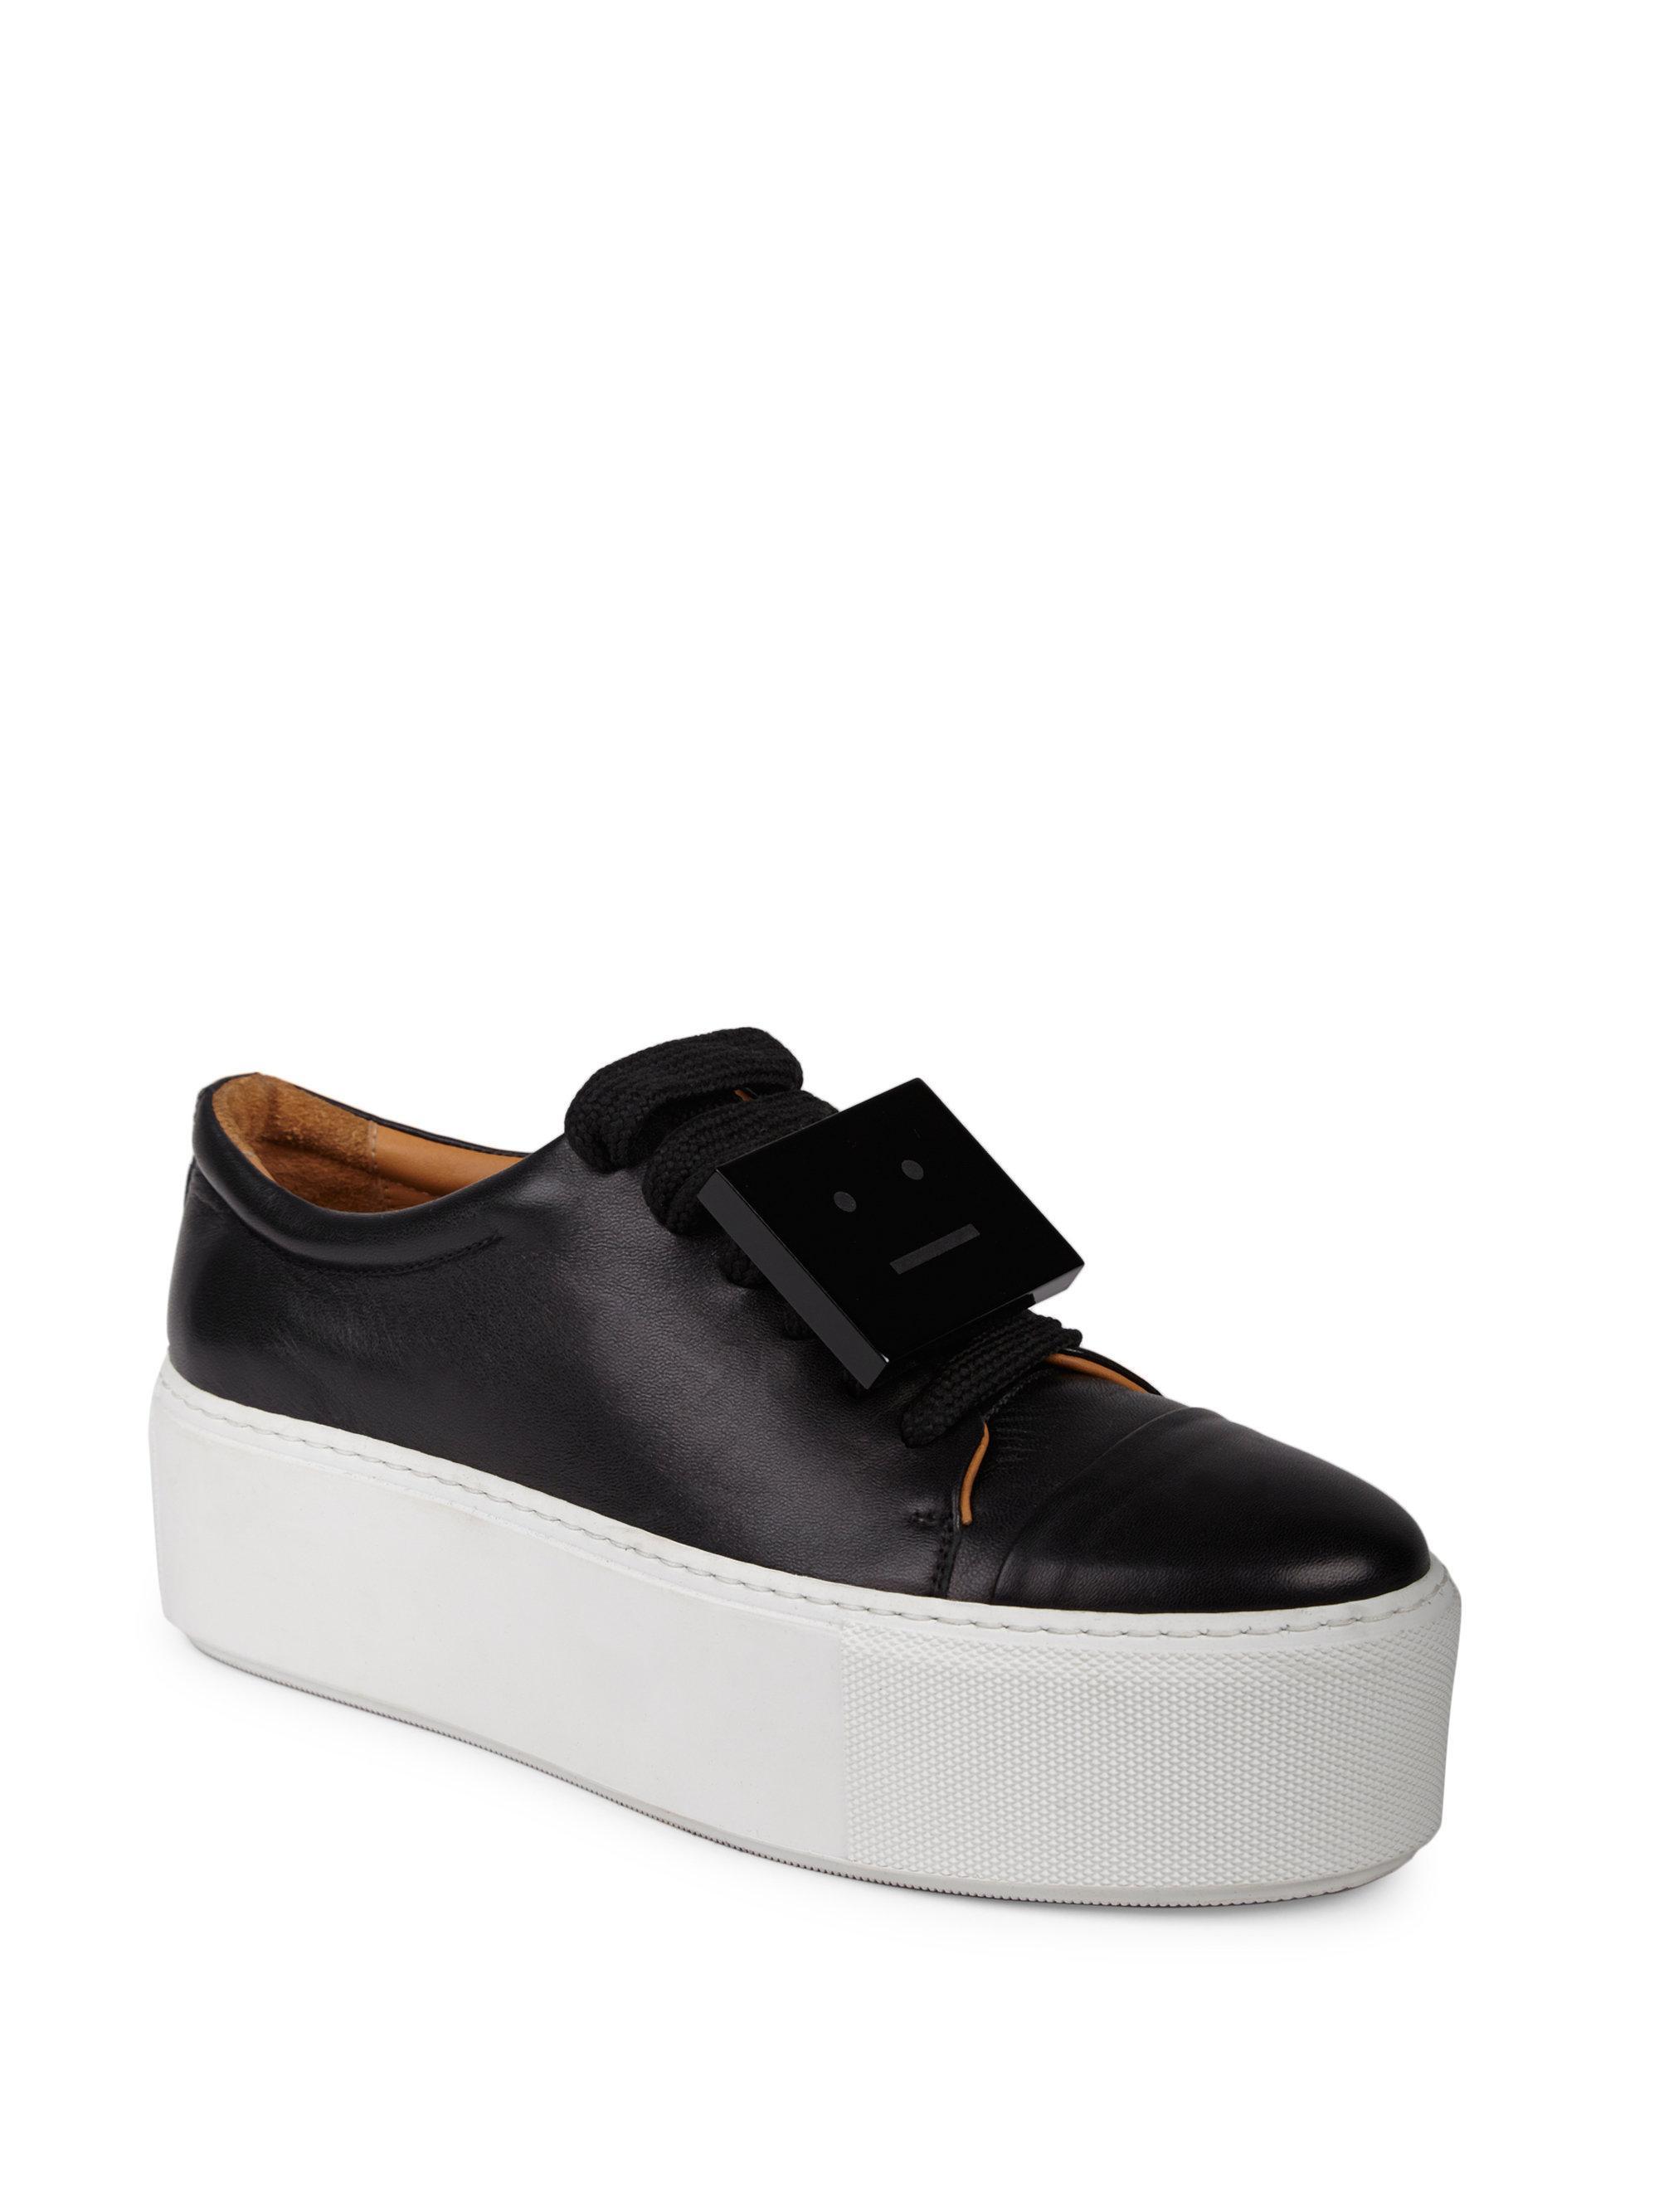 Acne Studios Black Leather Platform Sneakers bKhw1dB4aO